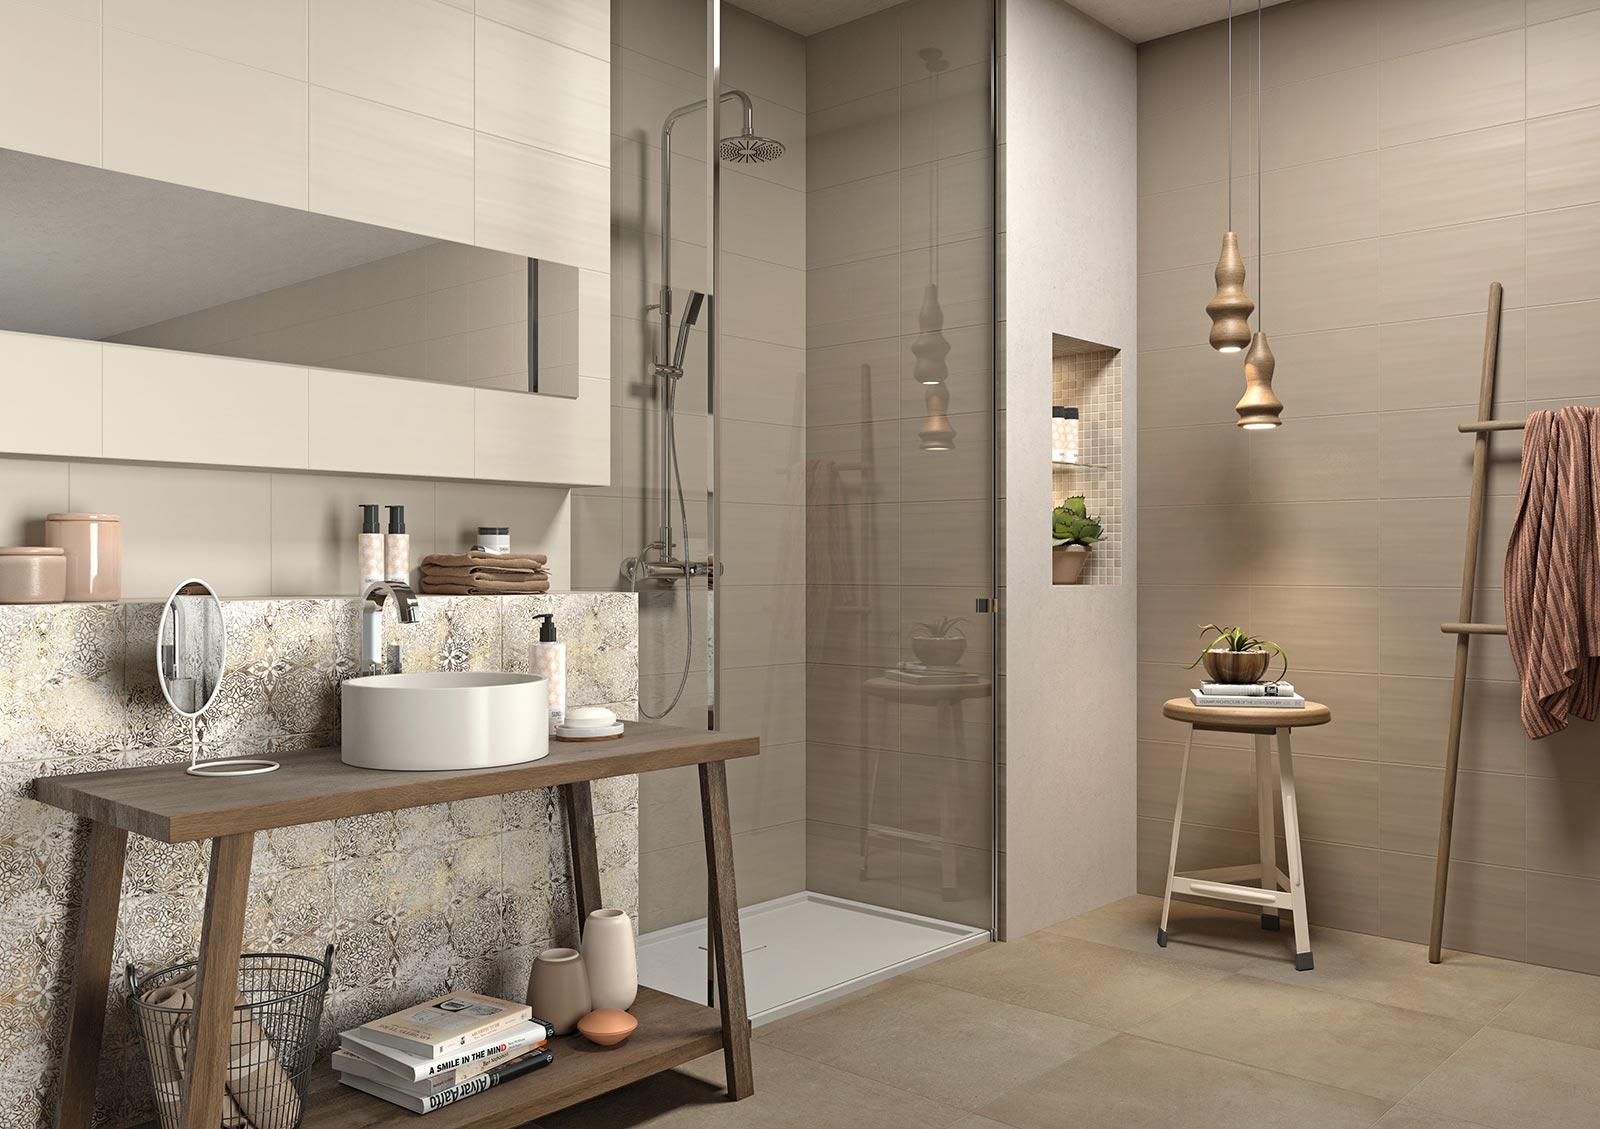 Neutral bathroom tiles - Neutral Ceramic Tiles Marazzi_7433